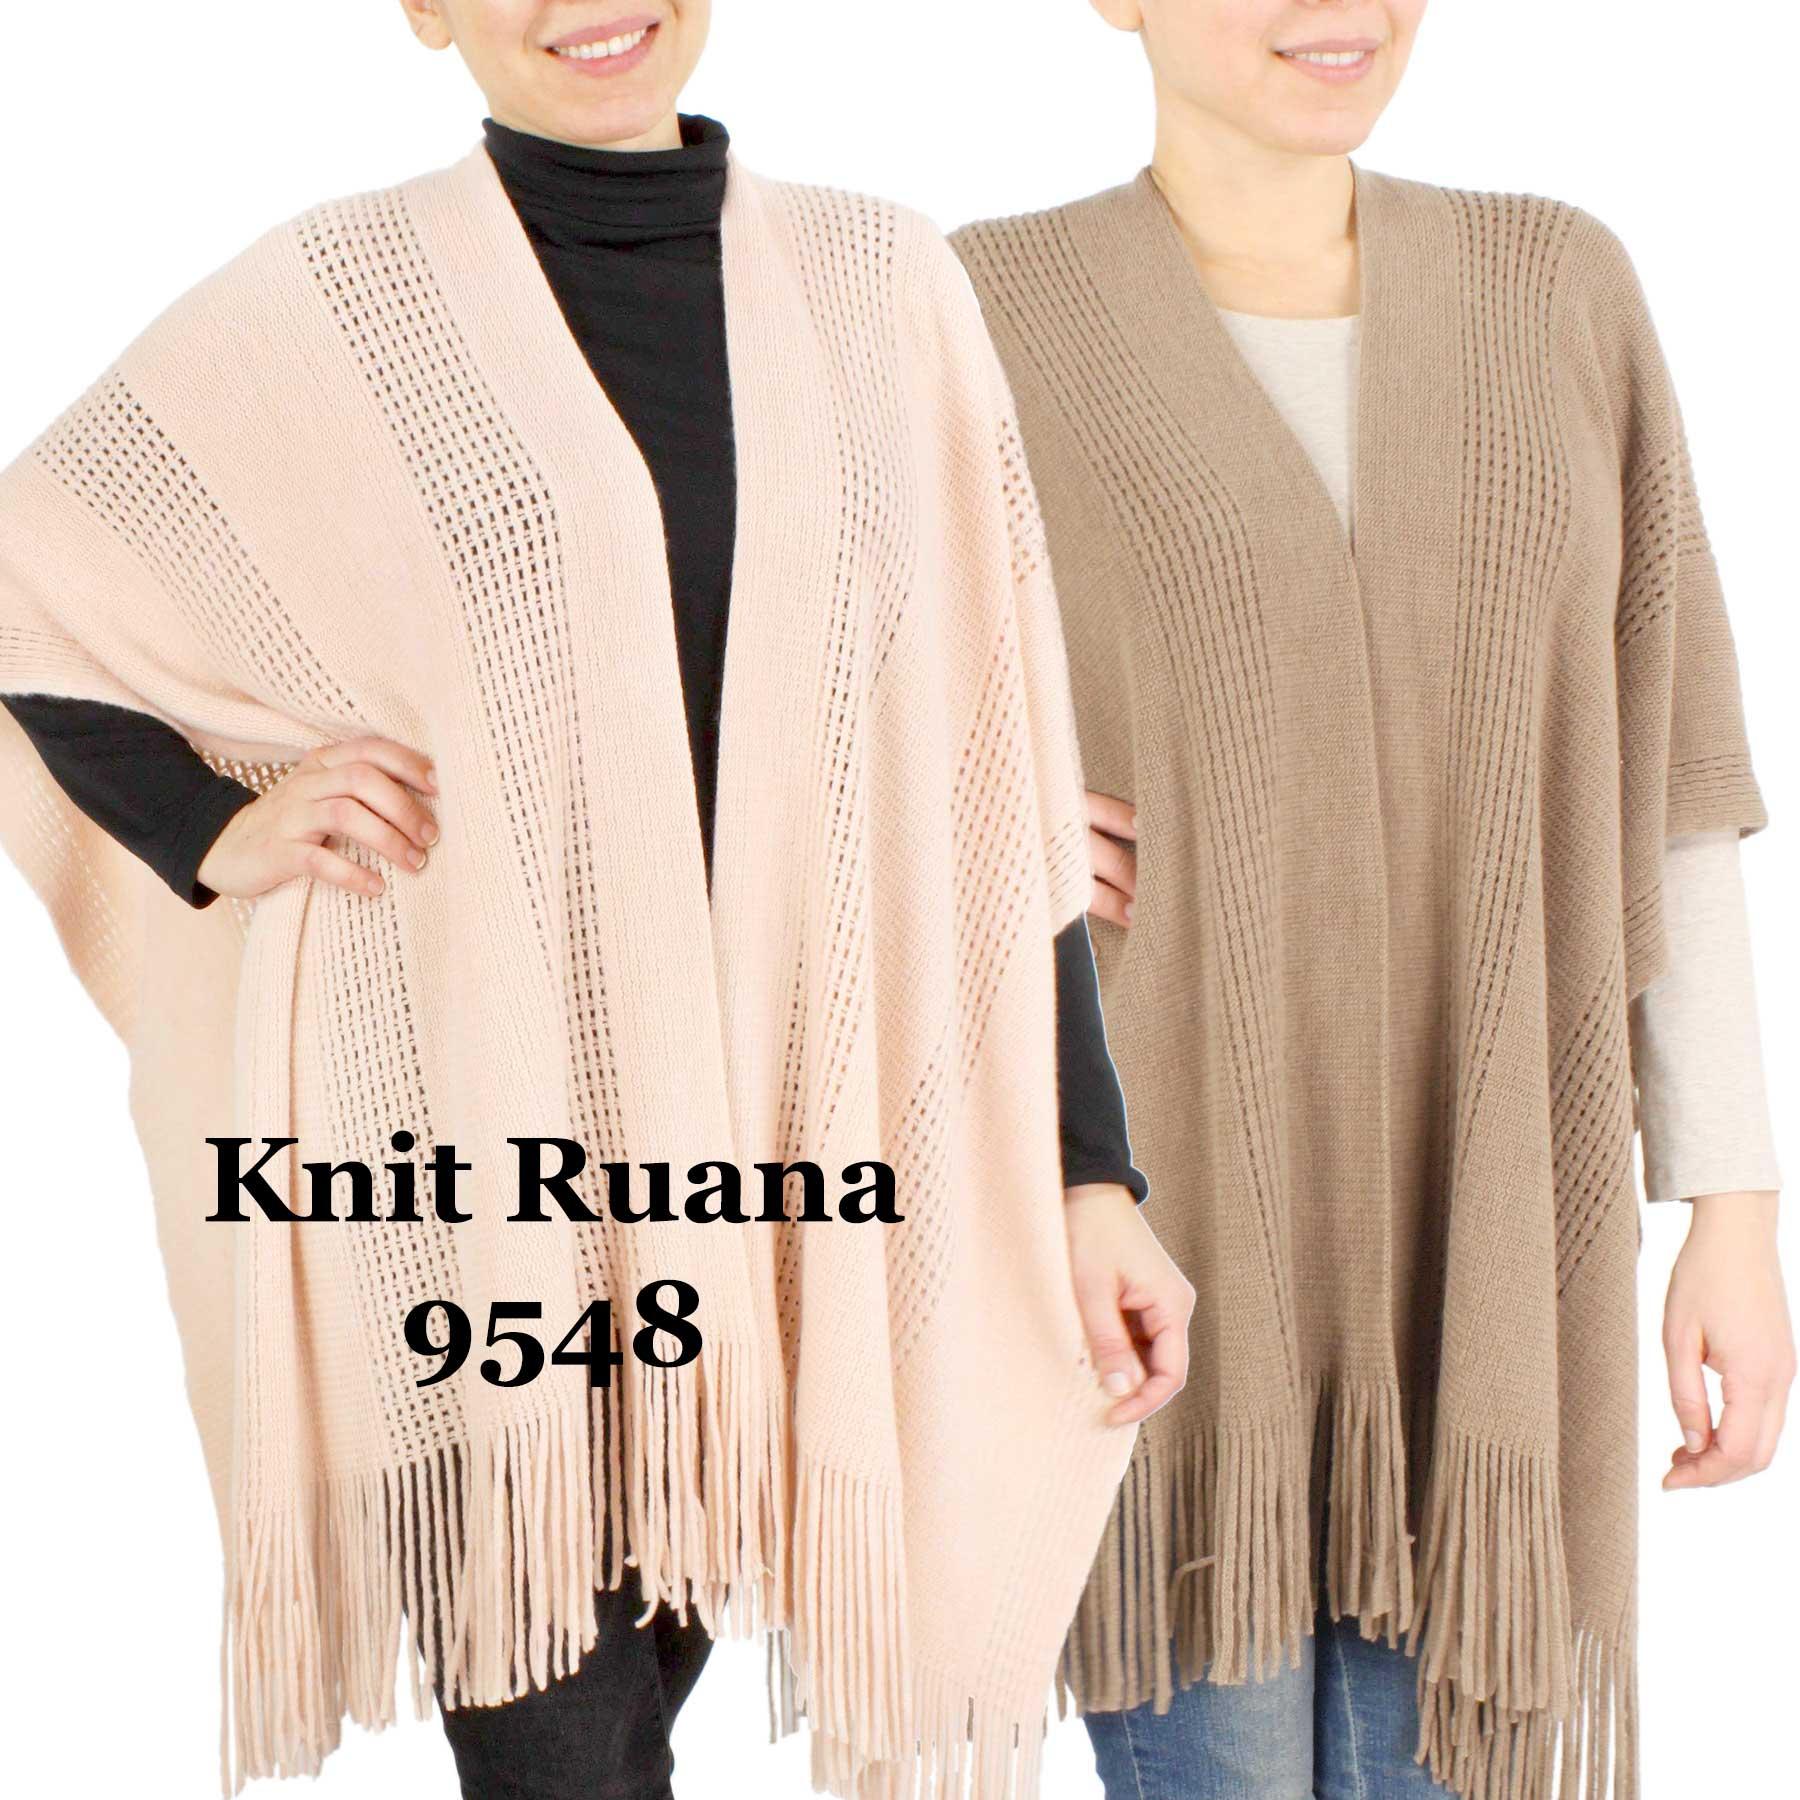 Ruana Capes - Knit Solid Color 9548